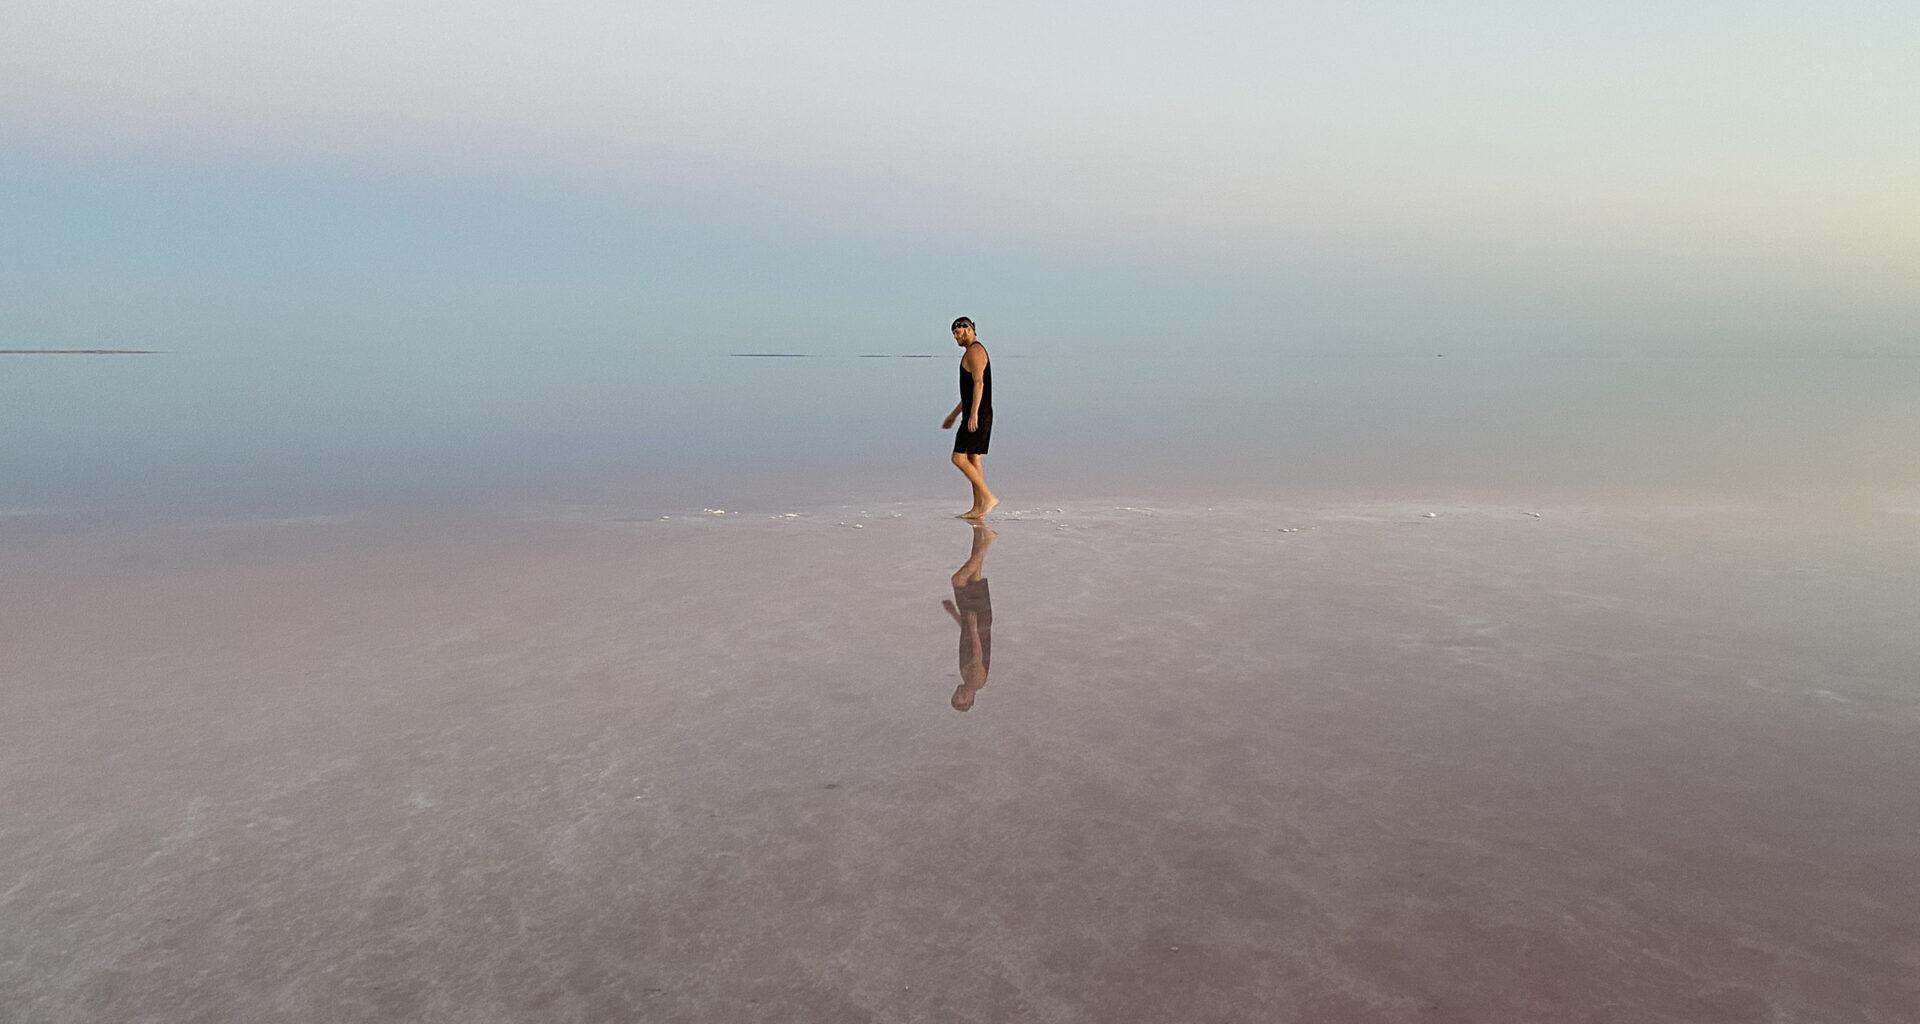 Lemurian lake, Лемурийское (Розовое) озеро